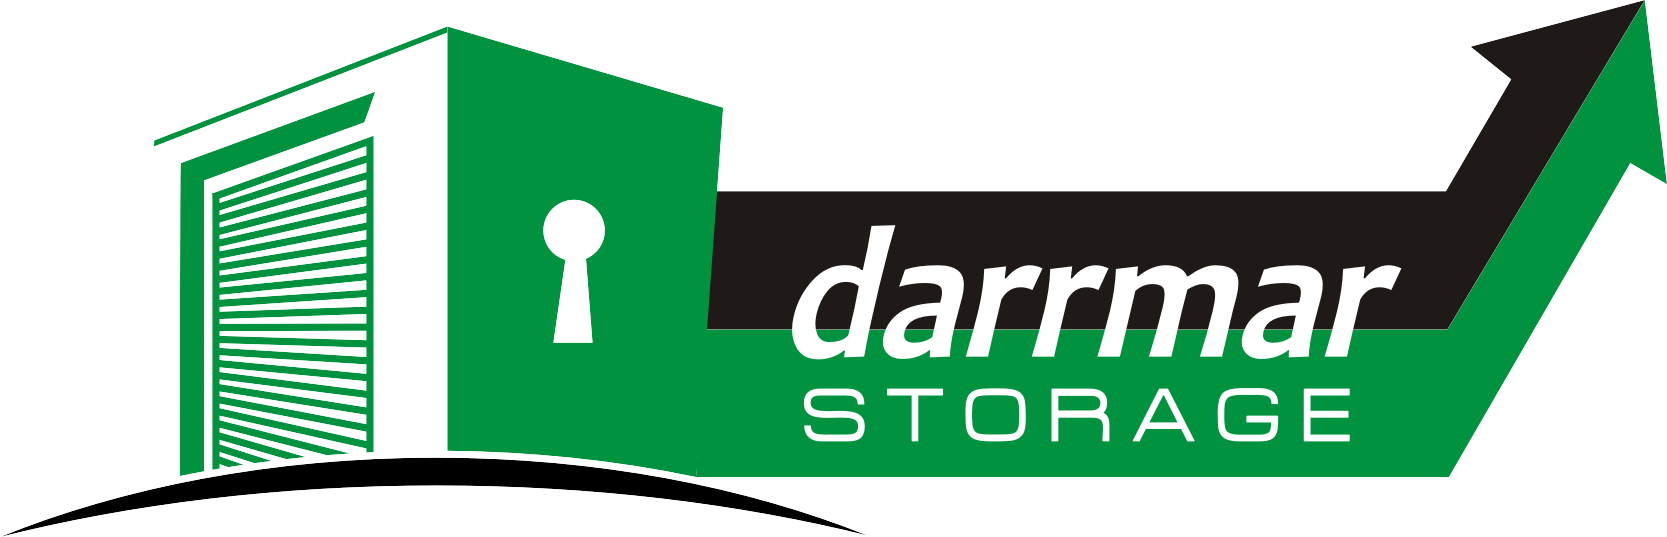 Darrmar Storage